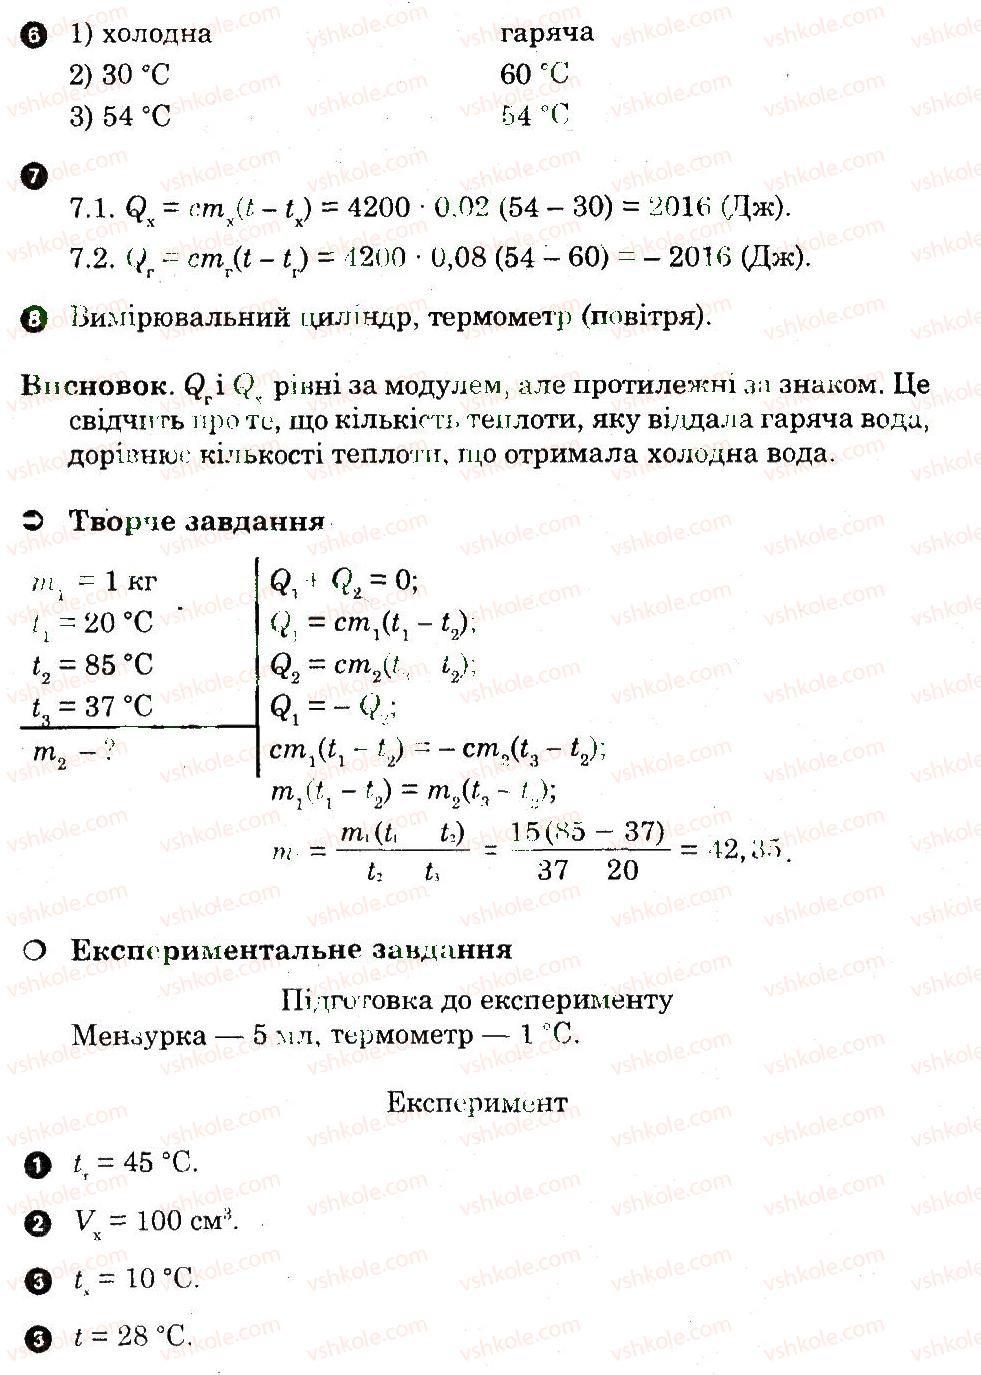 8-fizika-fya-bozhinova-oo-kiryuhina-2010-zoshit-dlya-laboratornih-robit--laboratorni-roboti-12-rnd1913.jpg